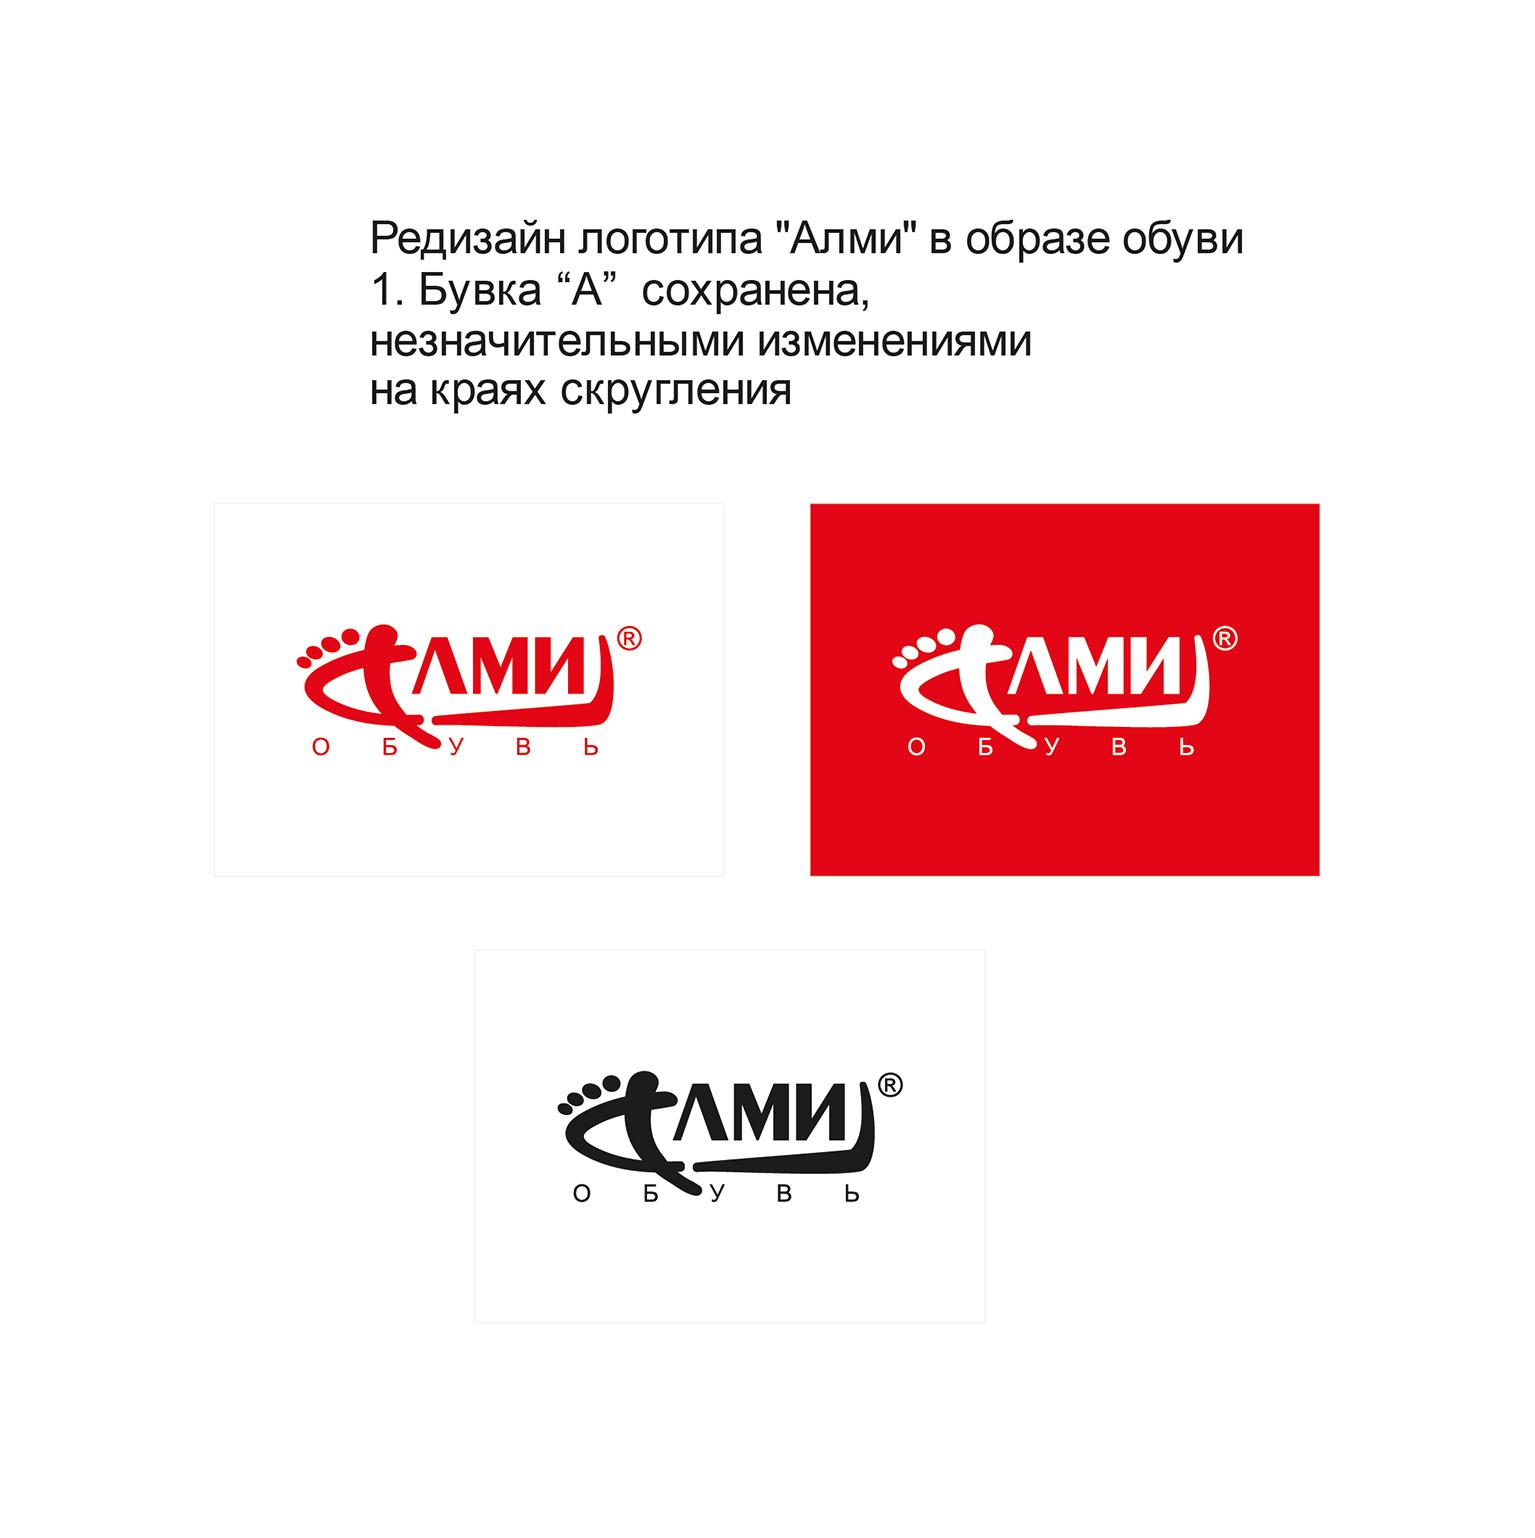 Дизайн логотипа обувной марки Алми фото f_96059eee4766ea9a.jpg